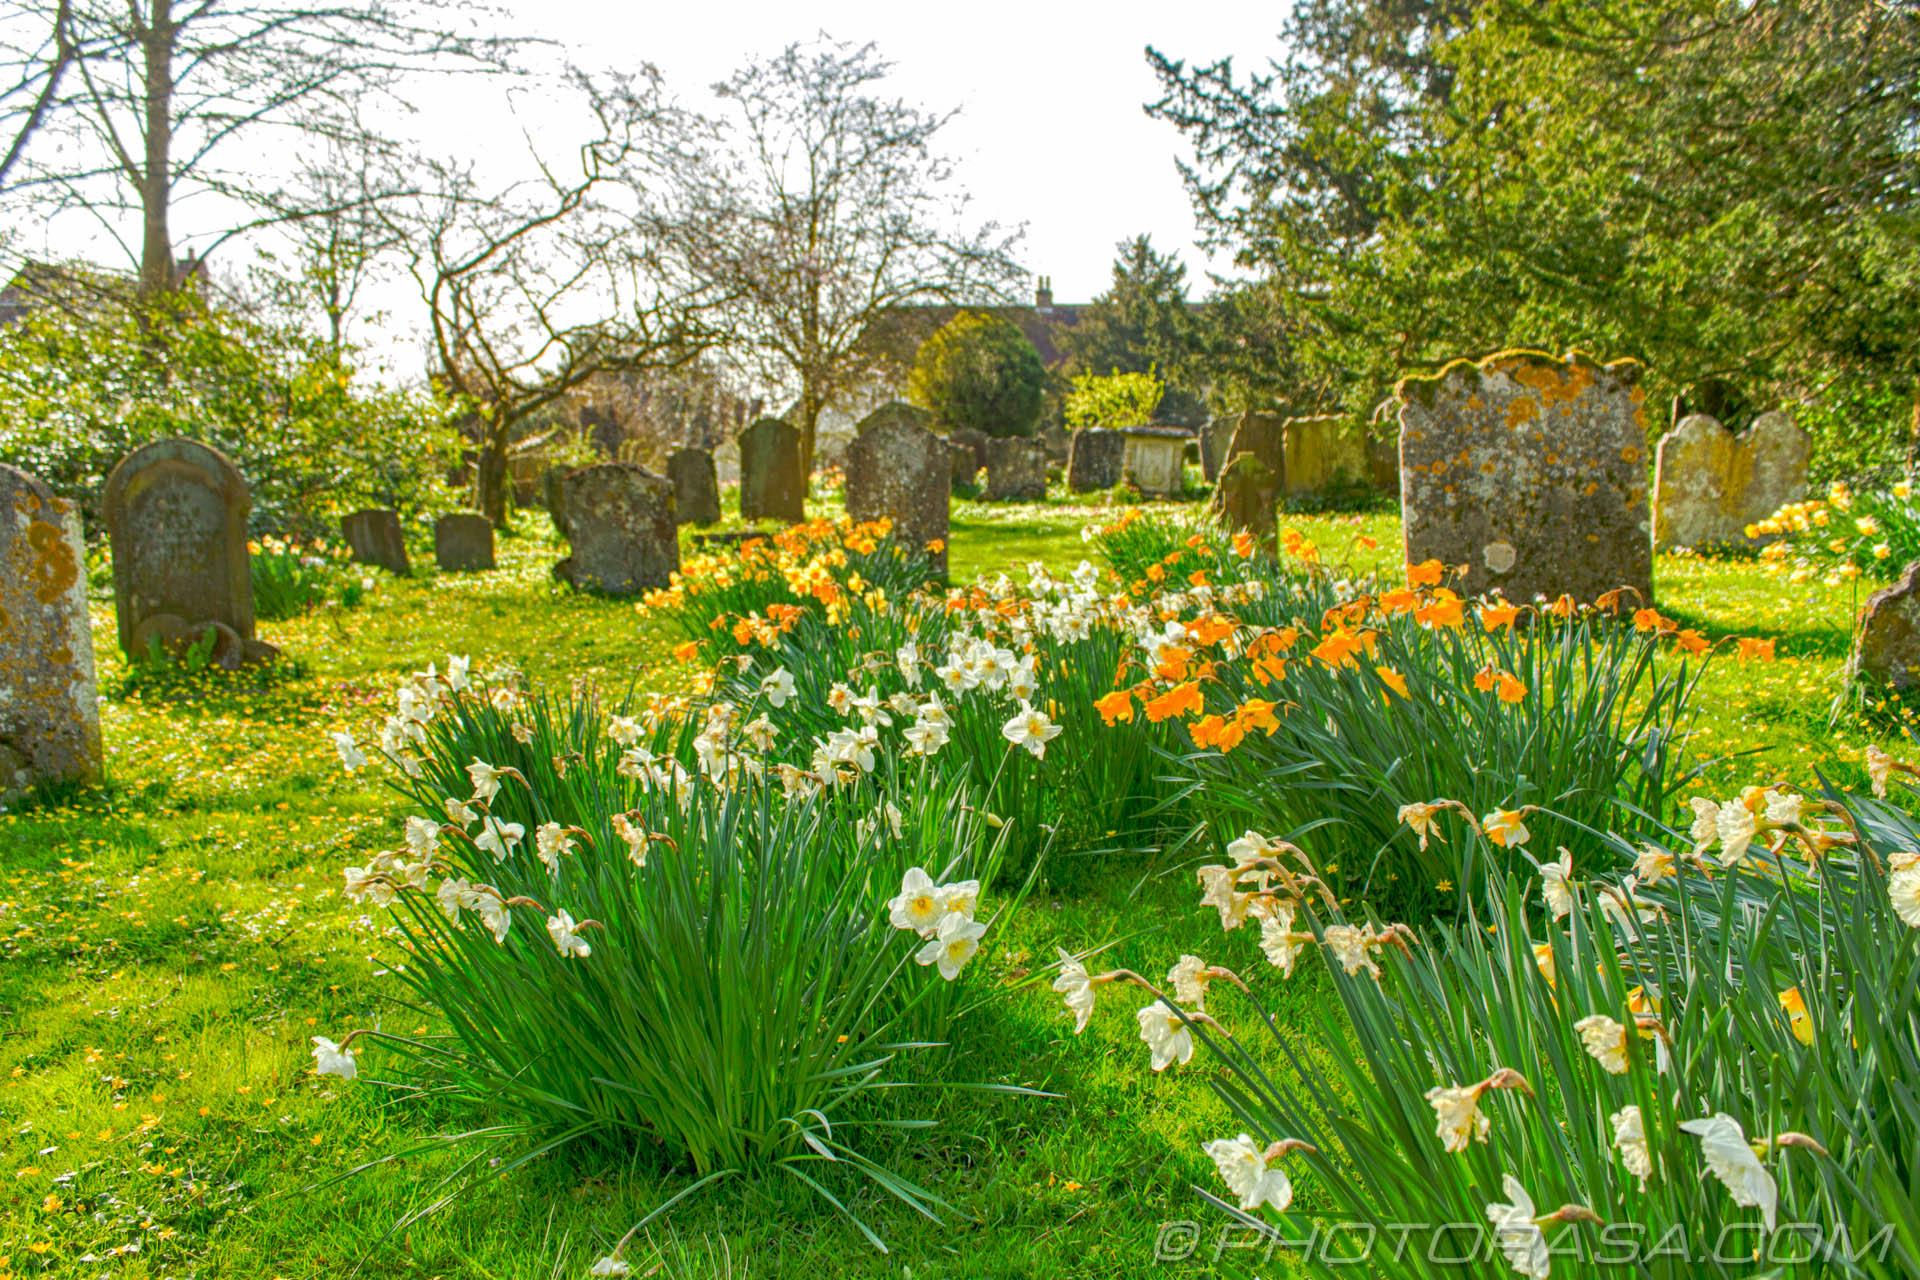 https://photorasa.com/saints-church-staplehurst-kent/yellow-and-white-daffodils-in-the-churchyard/